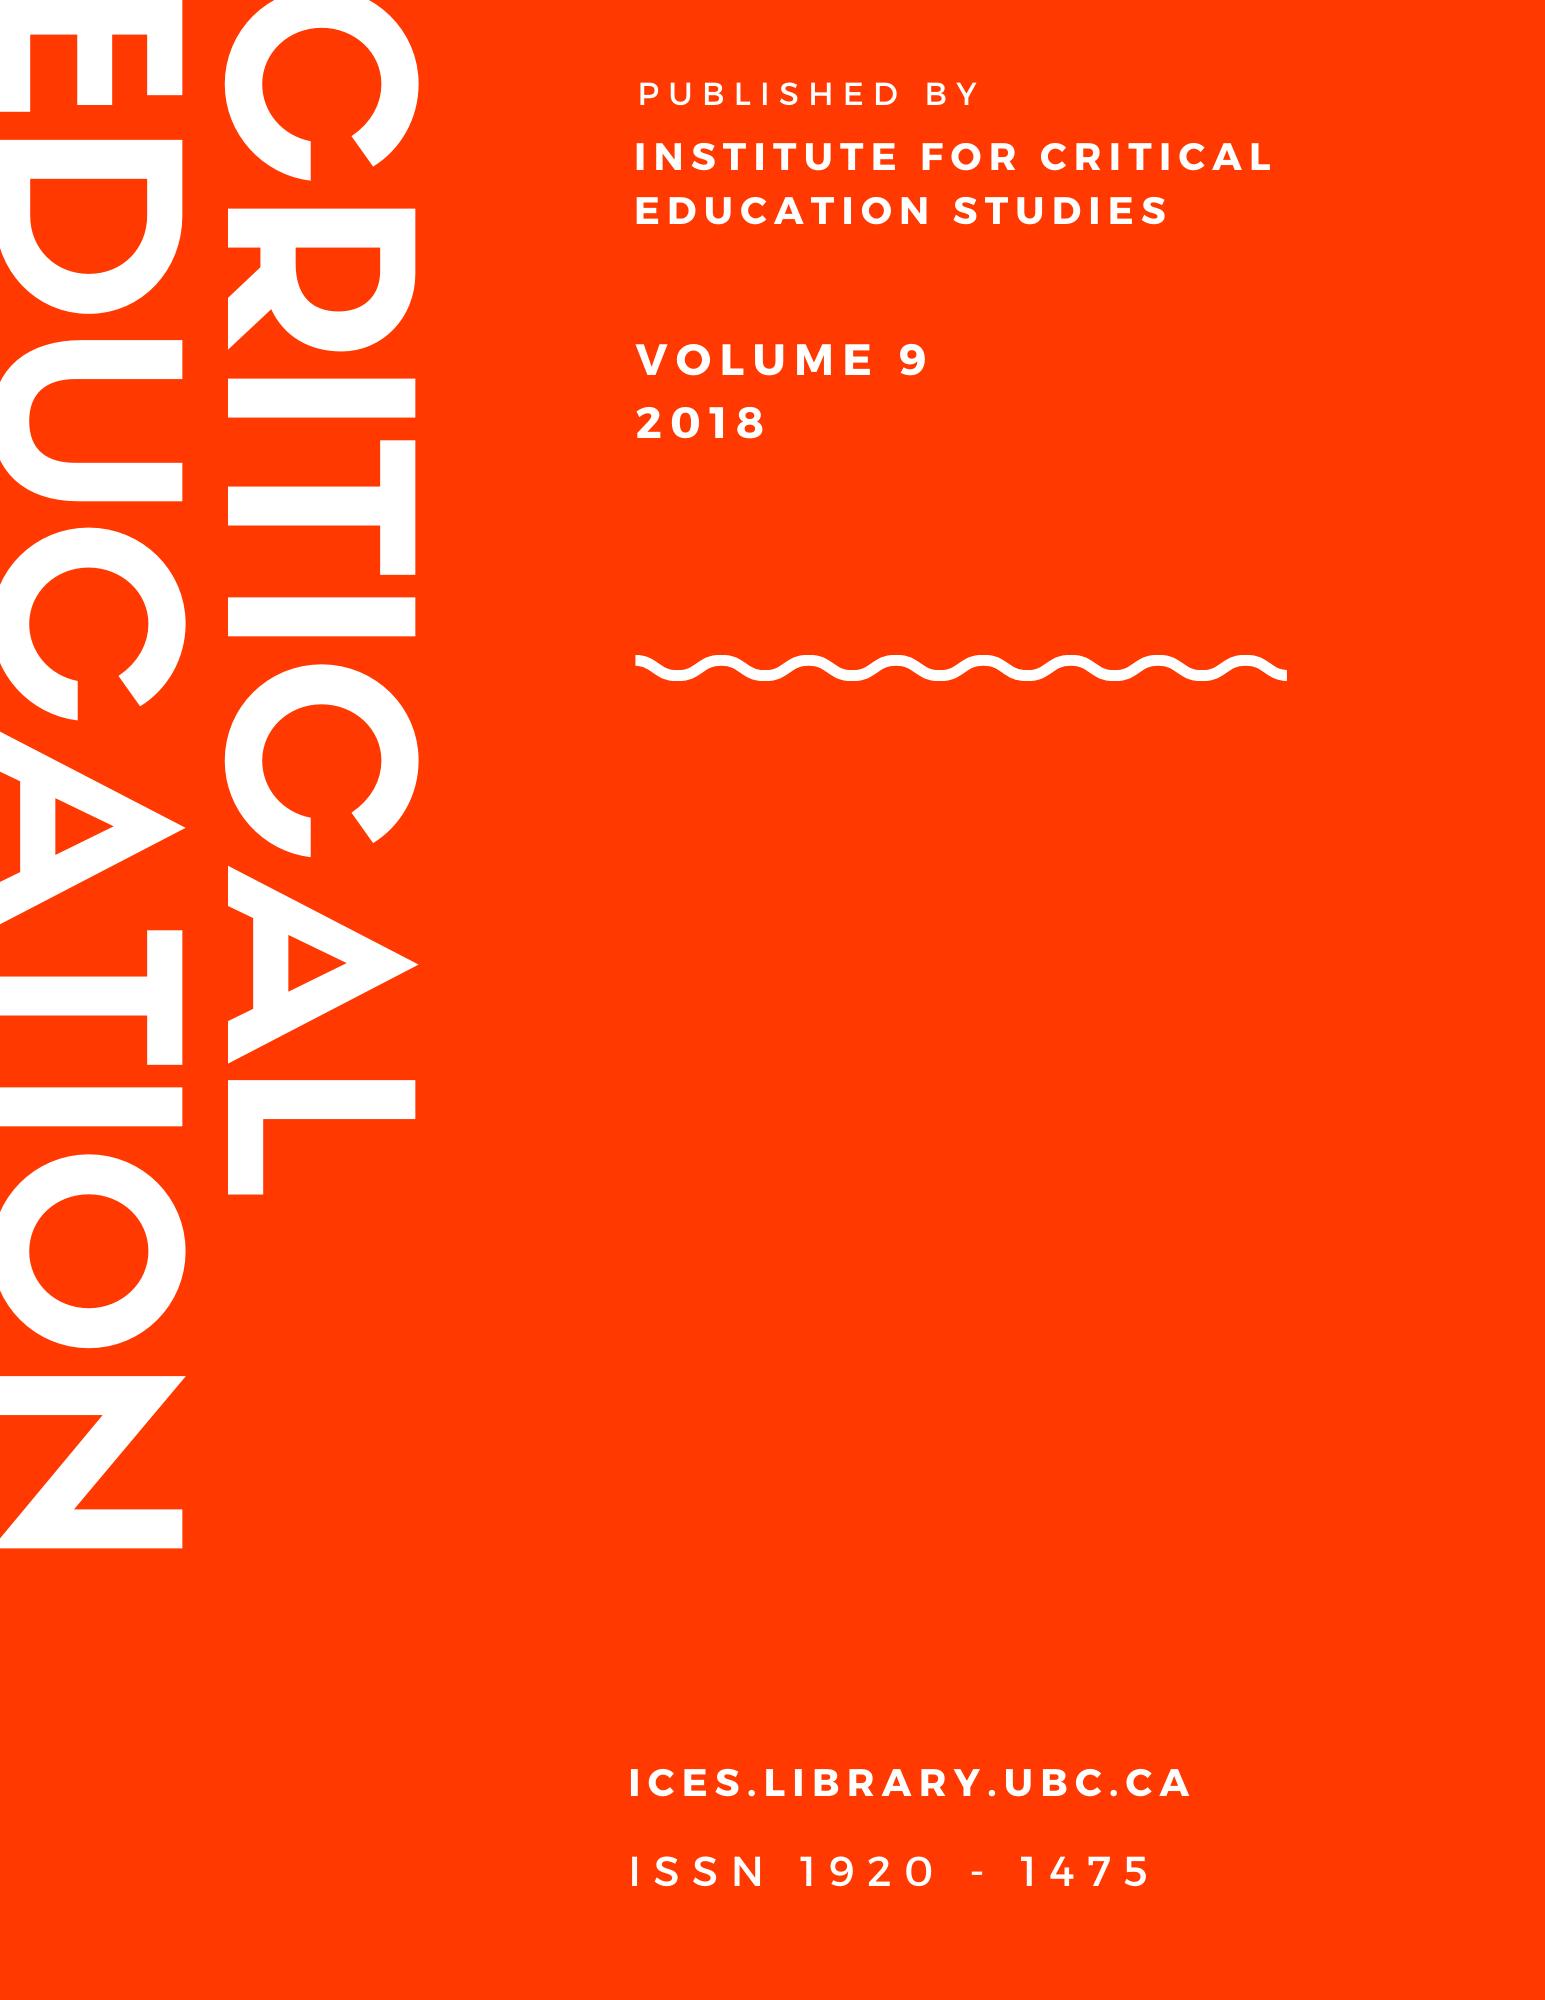 View Vol. 9 No. 18 (2018)